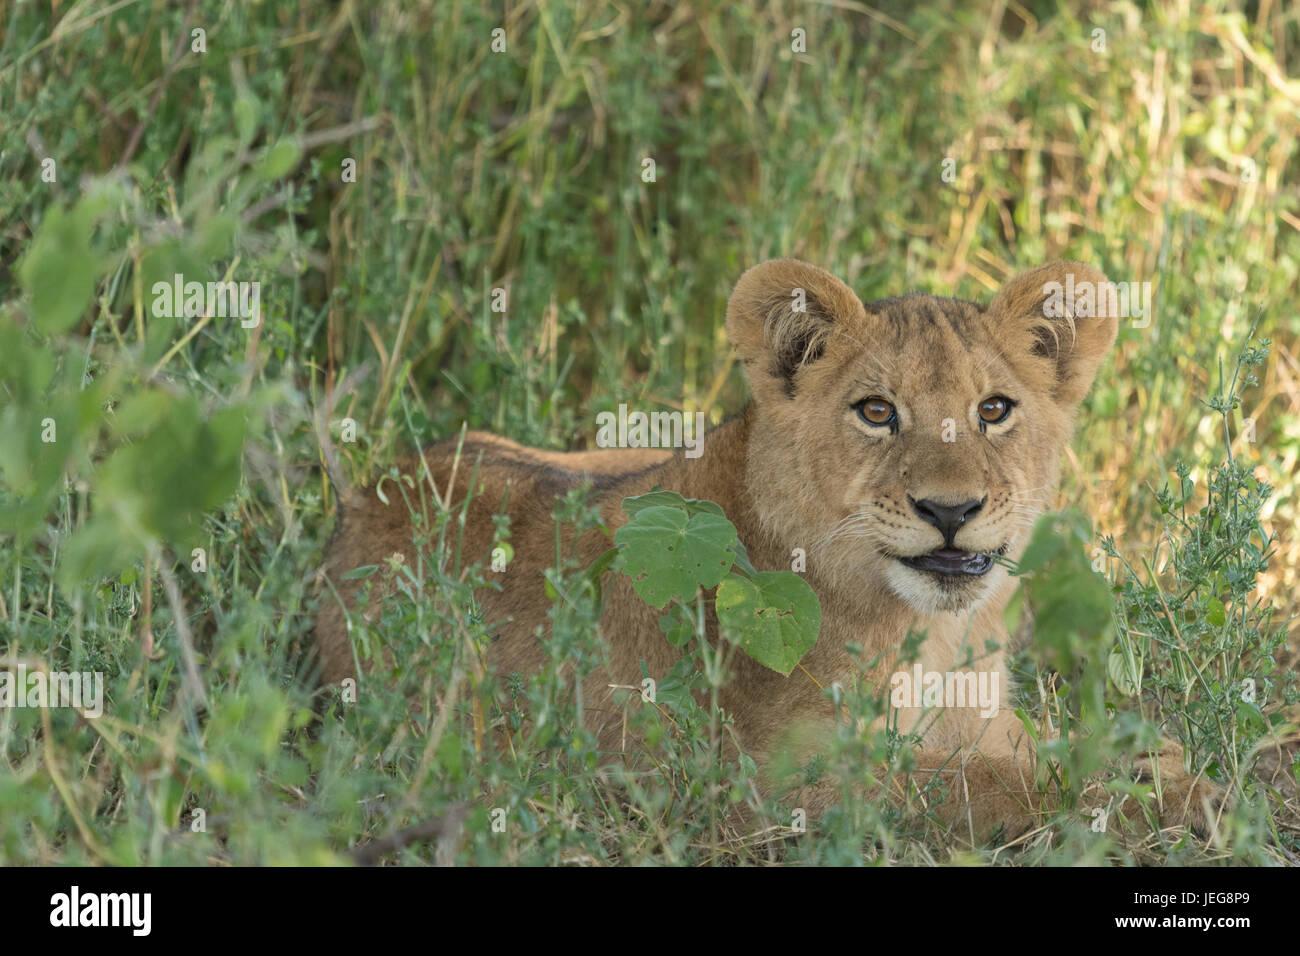 Lioness (Panthera leo) lying in grass in Okavango Delta Botswana - Stock Image